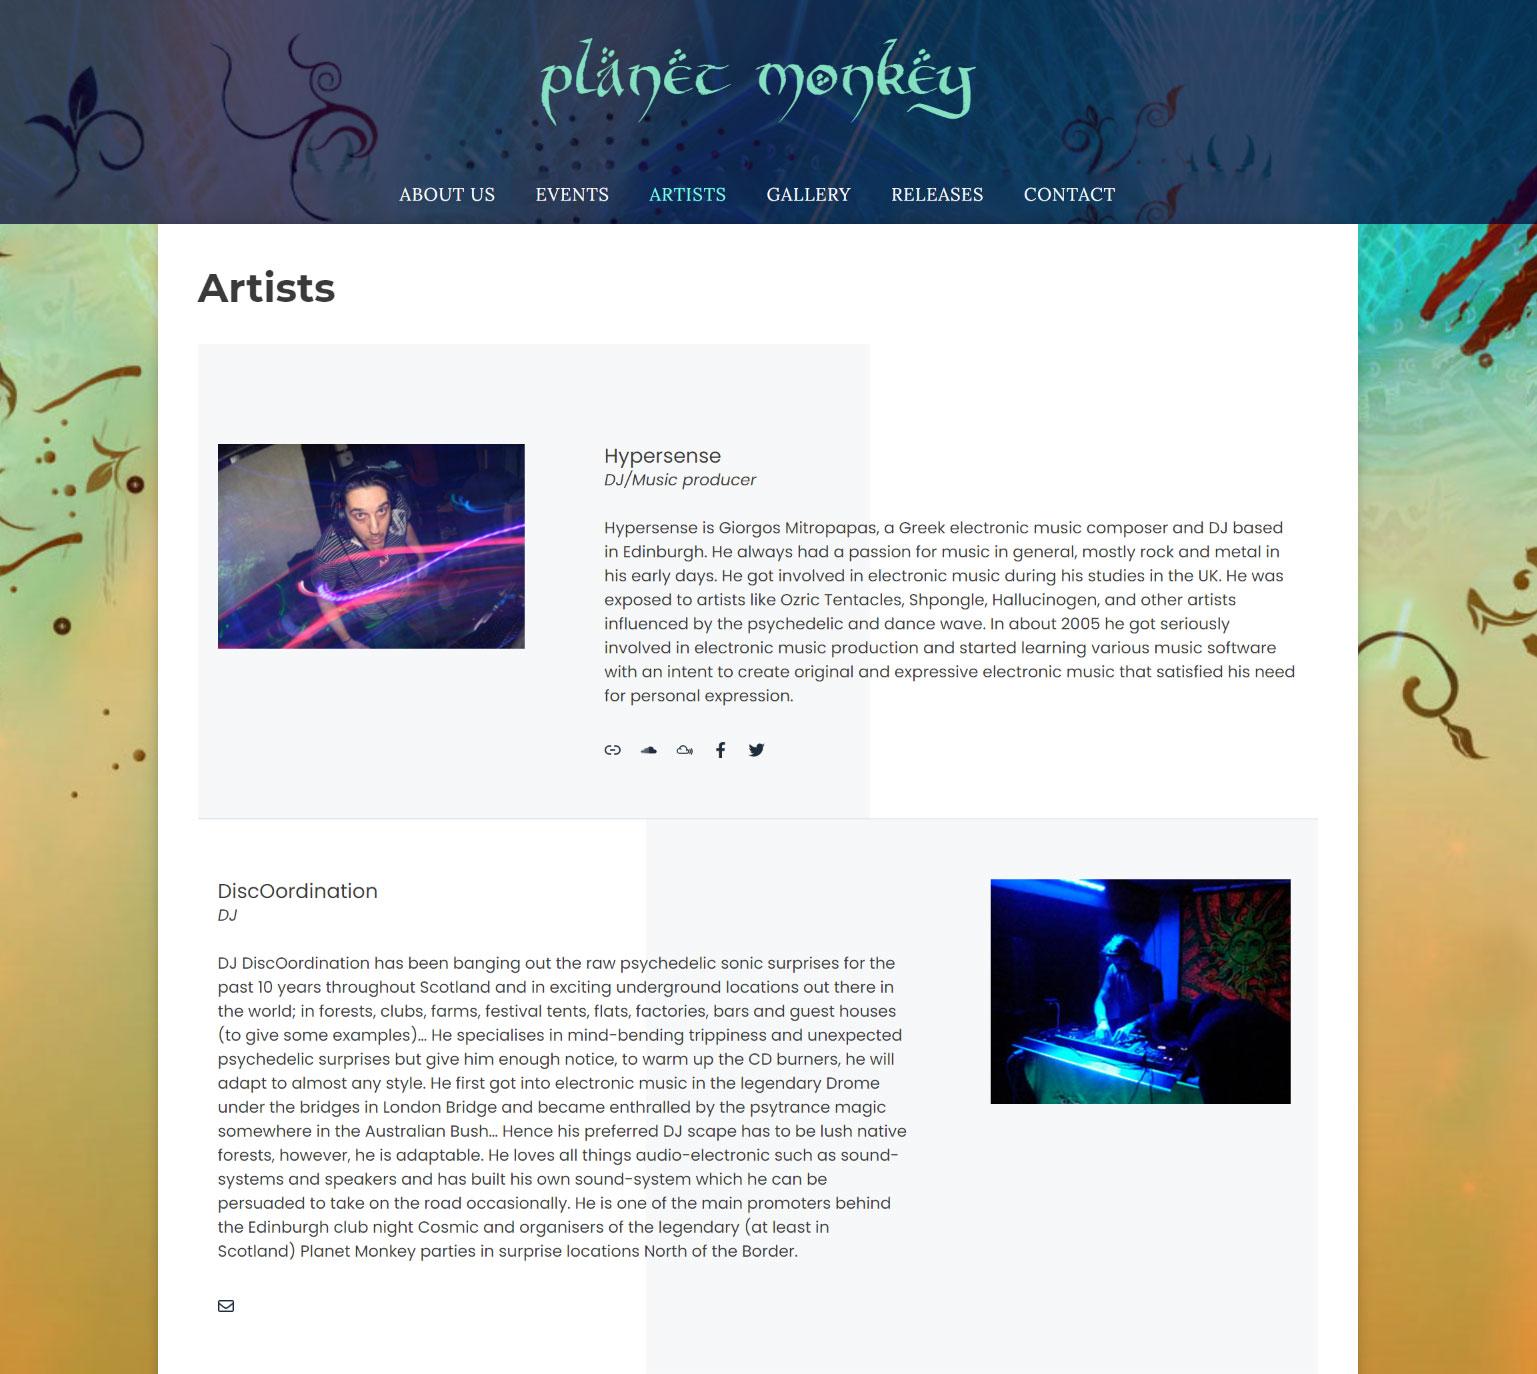 Planet Monkey homepage image